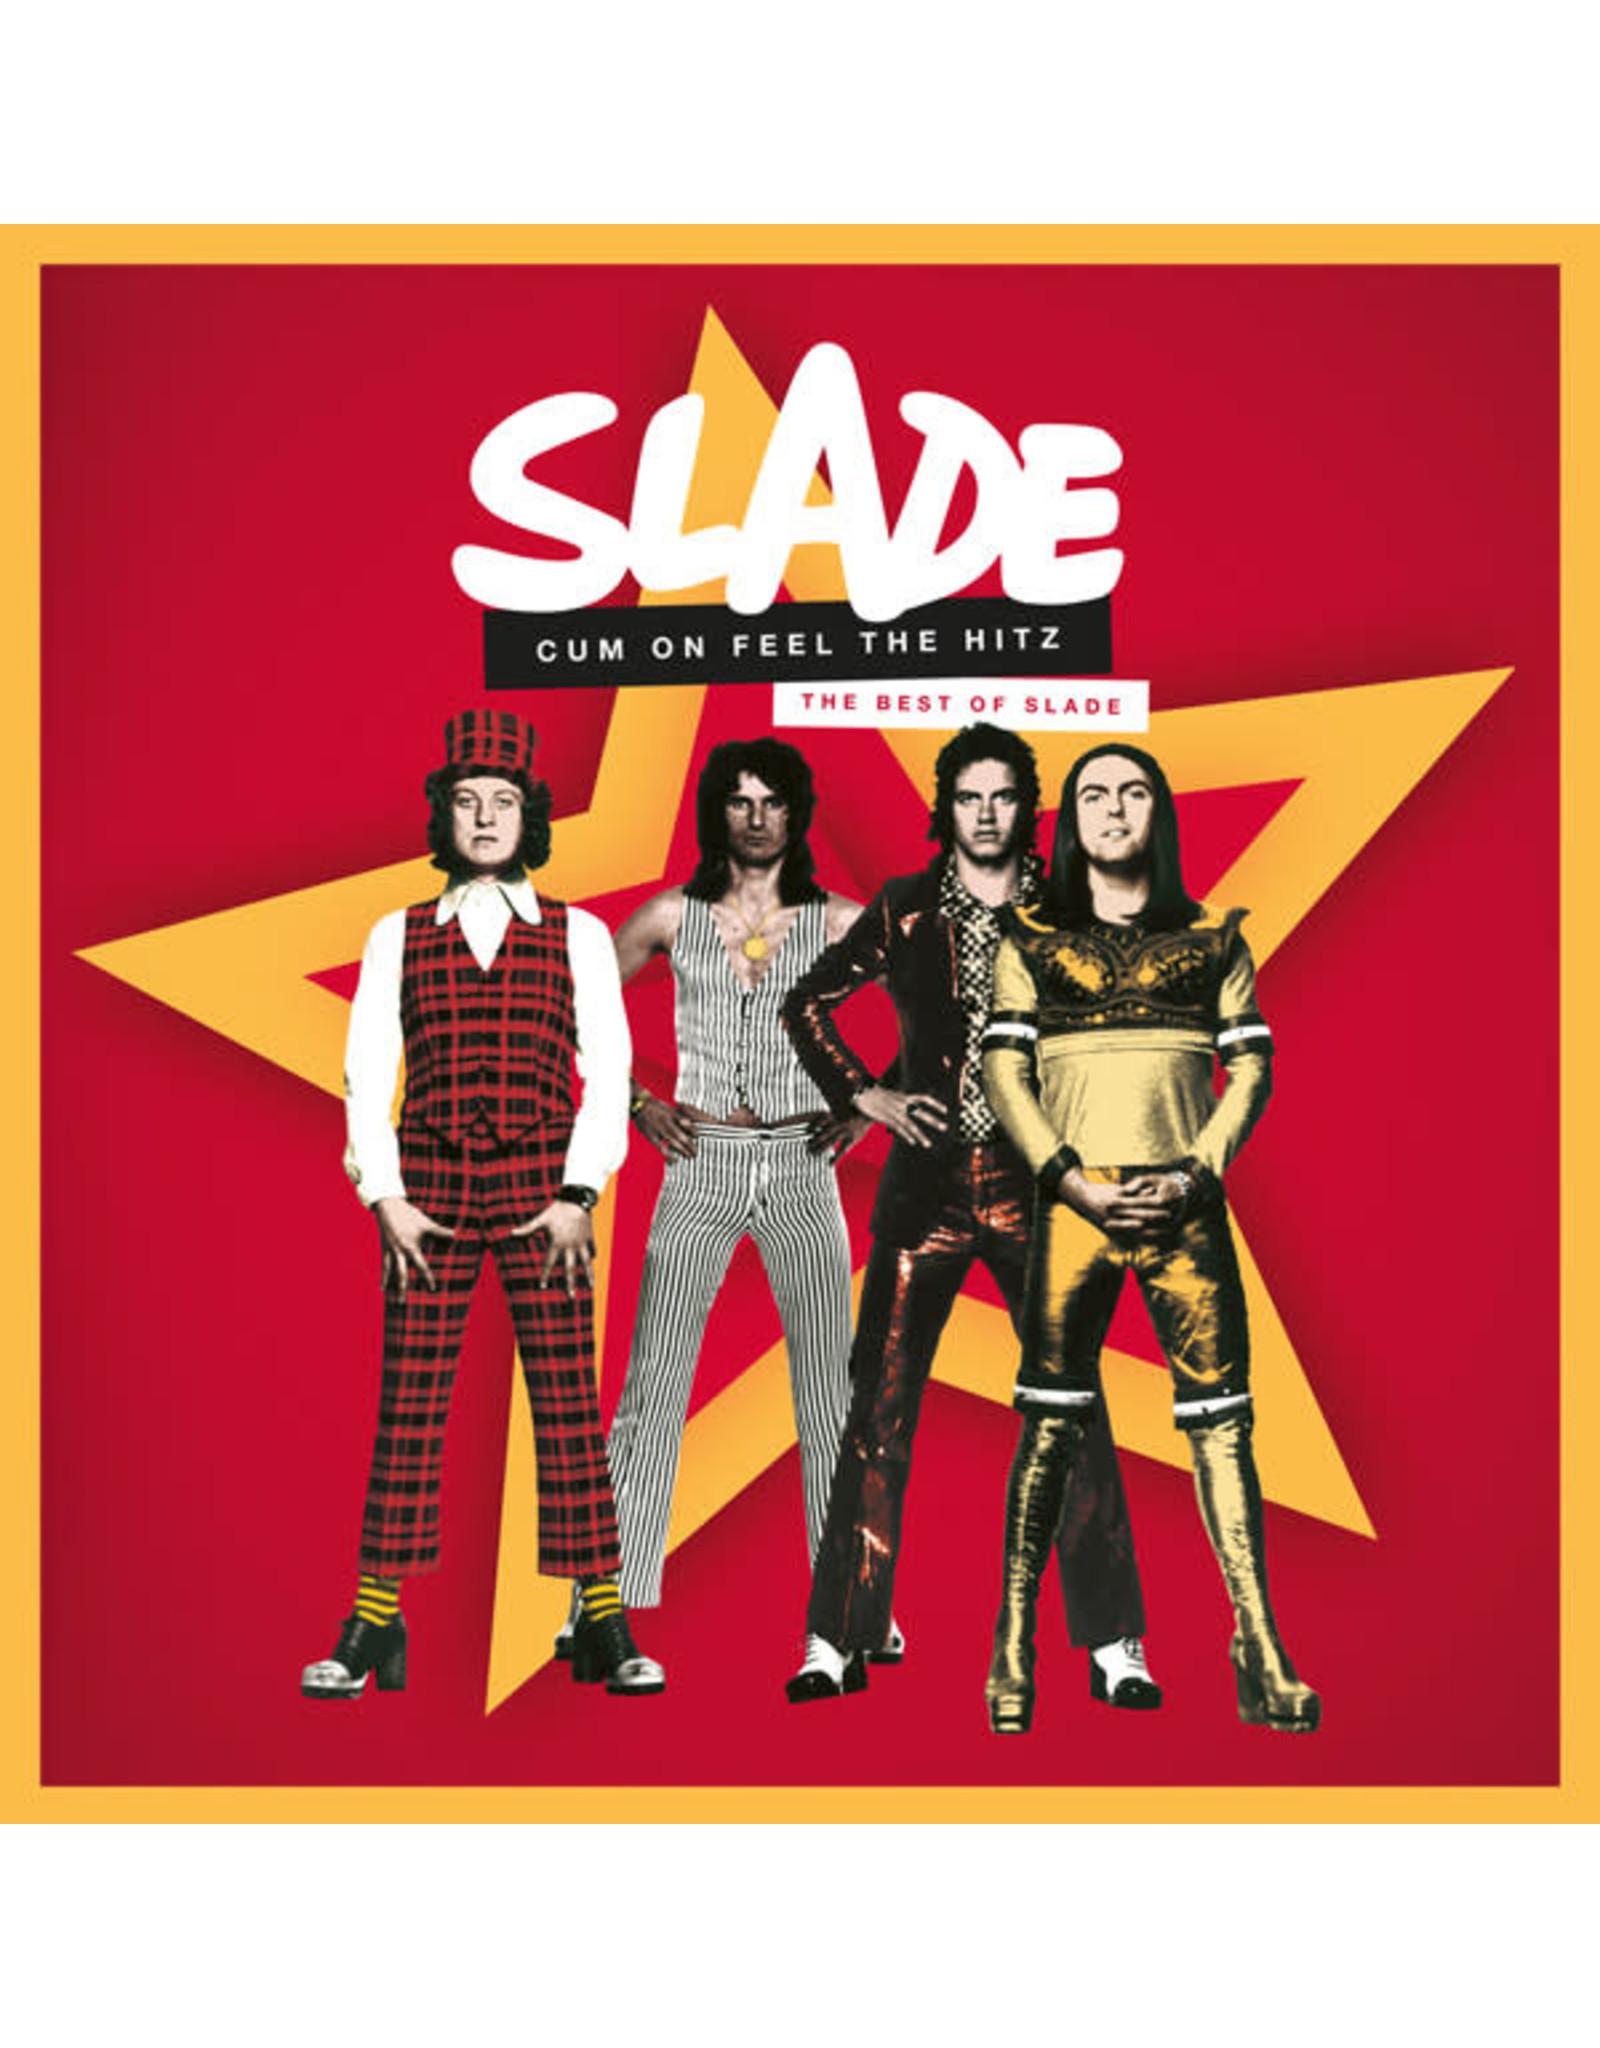 Vinyl Slade - Cum On Feel The Hitz (The Best Of Slade)